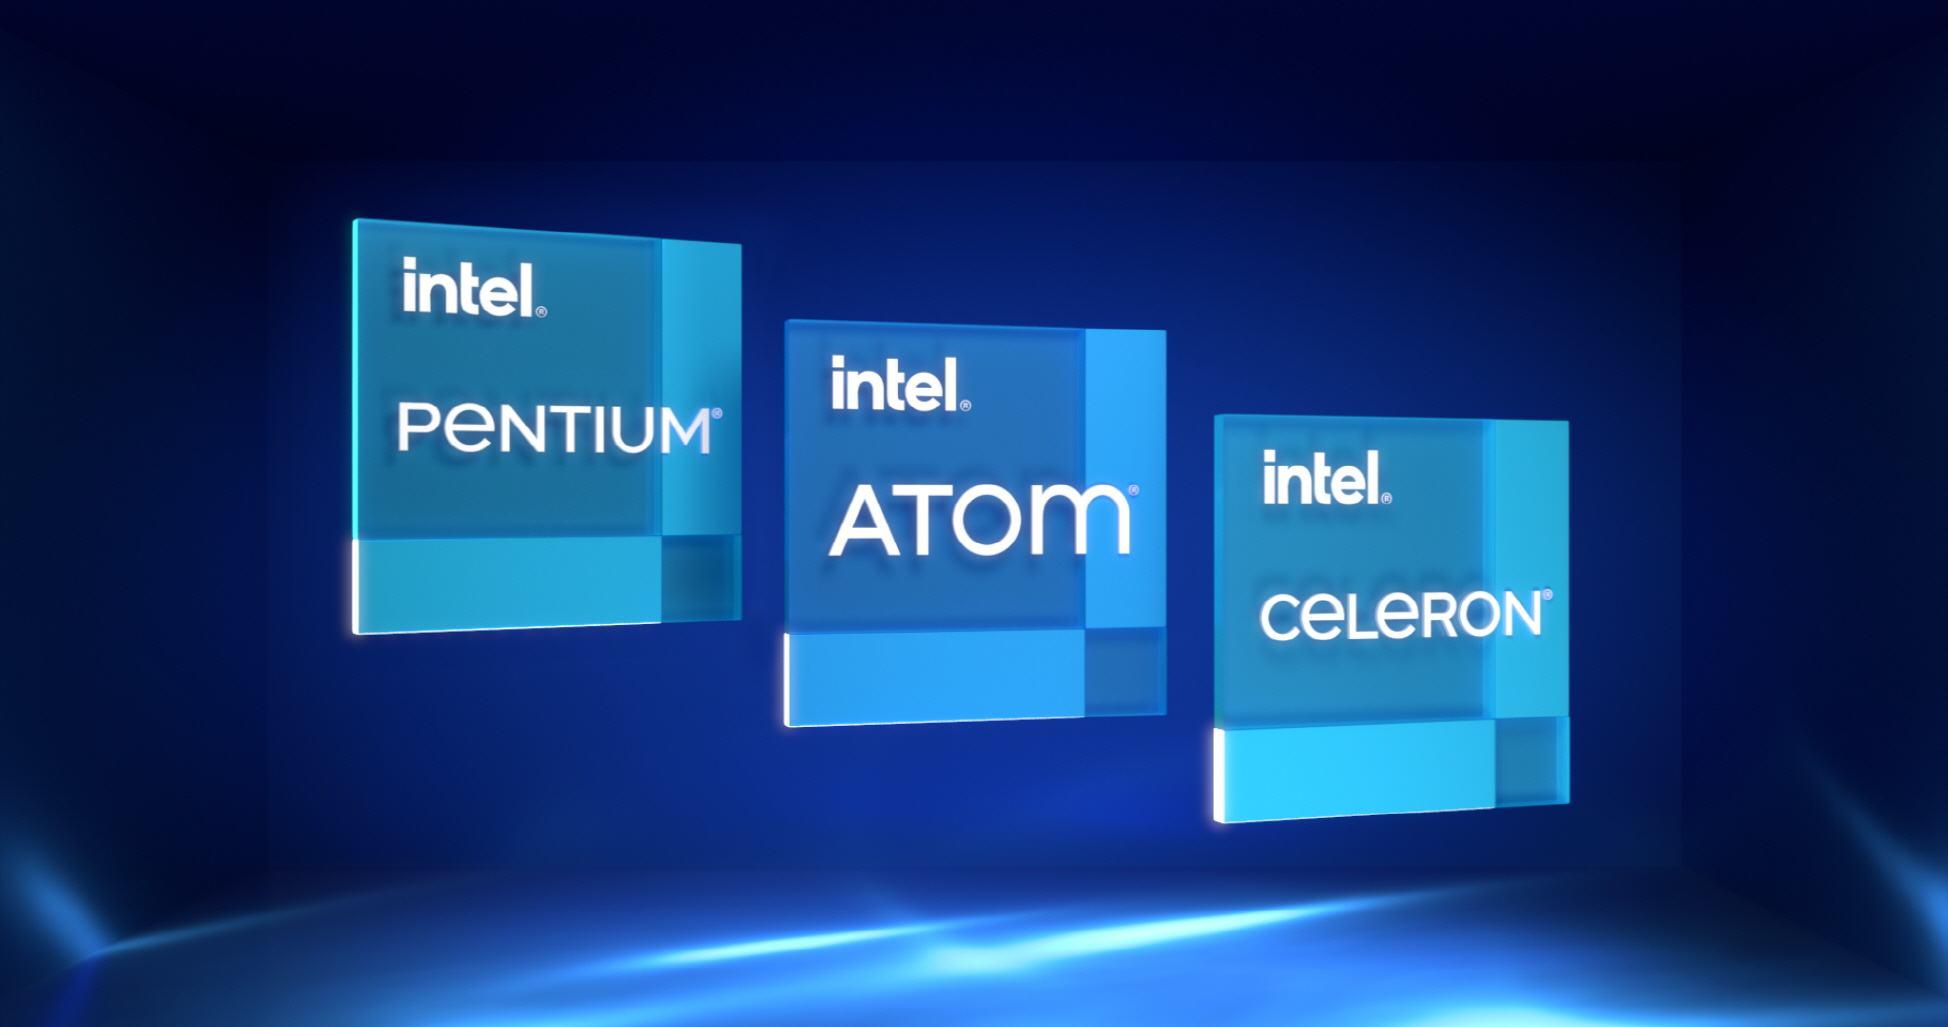 200924_Intel Industrial Summit_Contents (3)